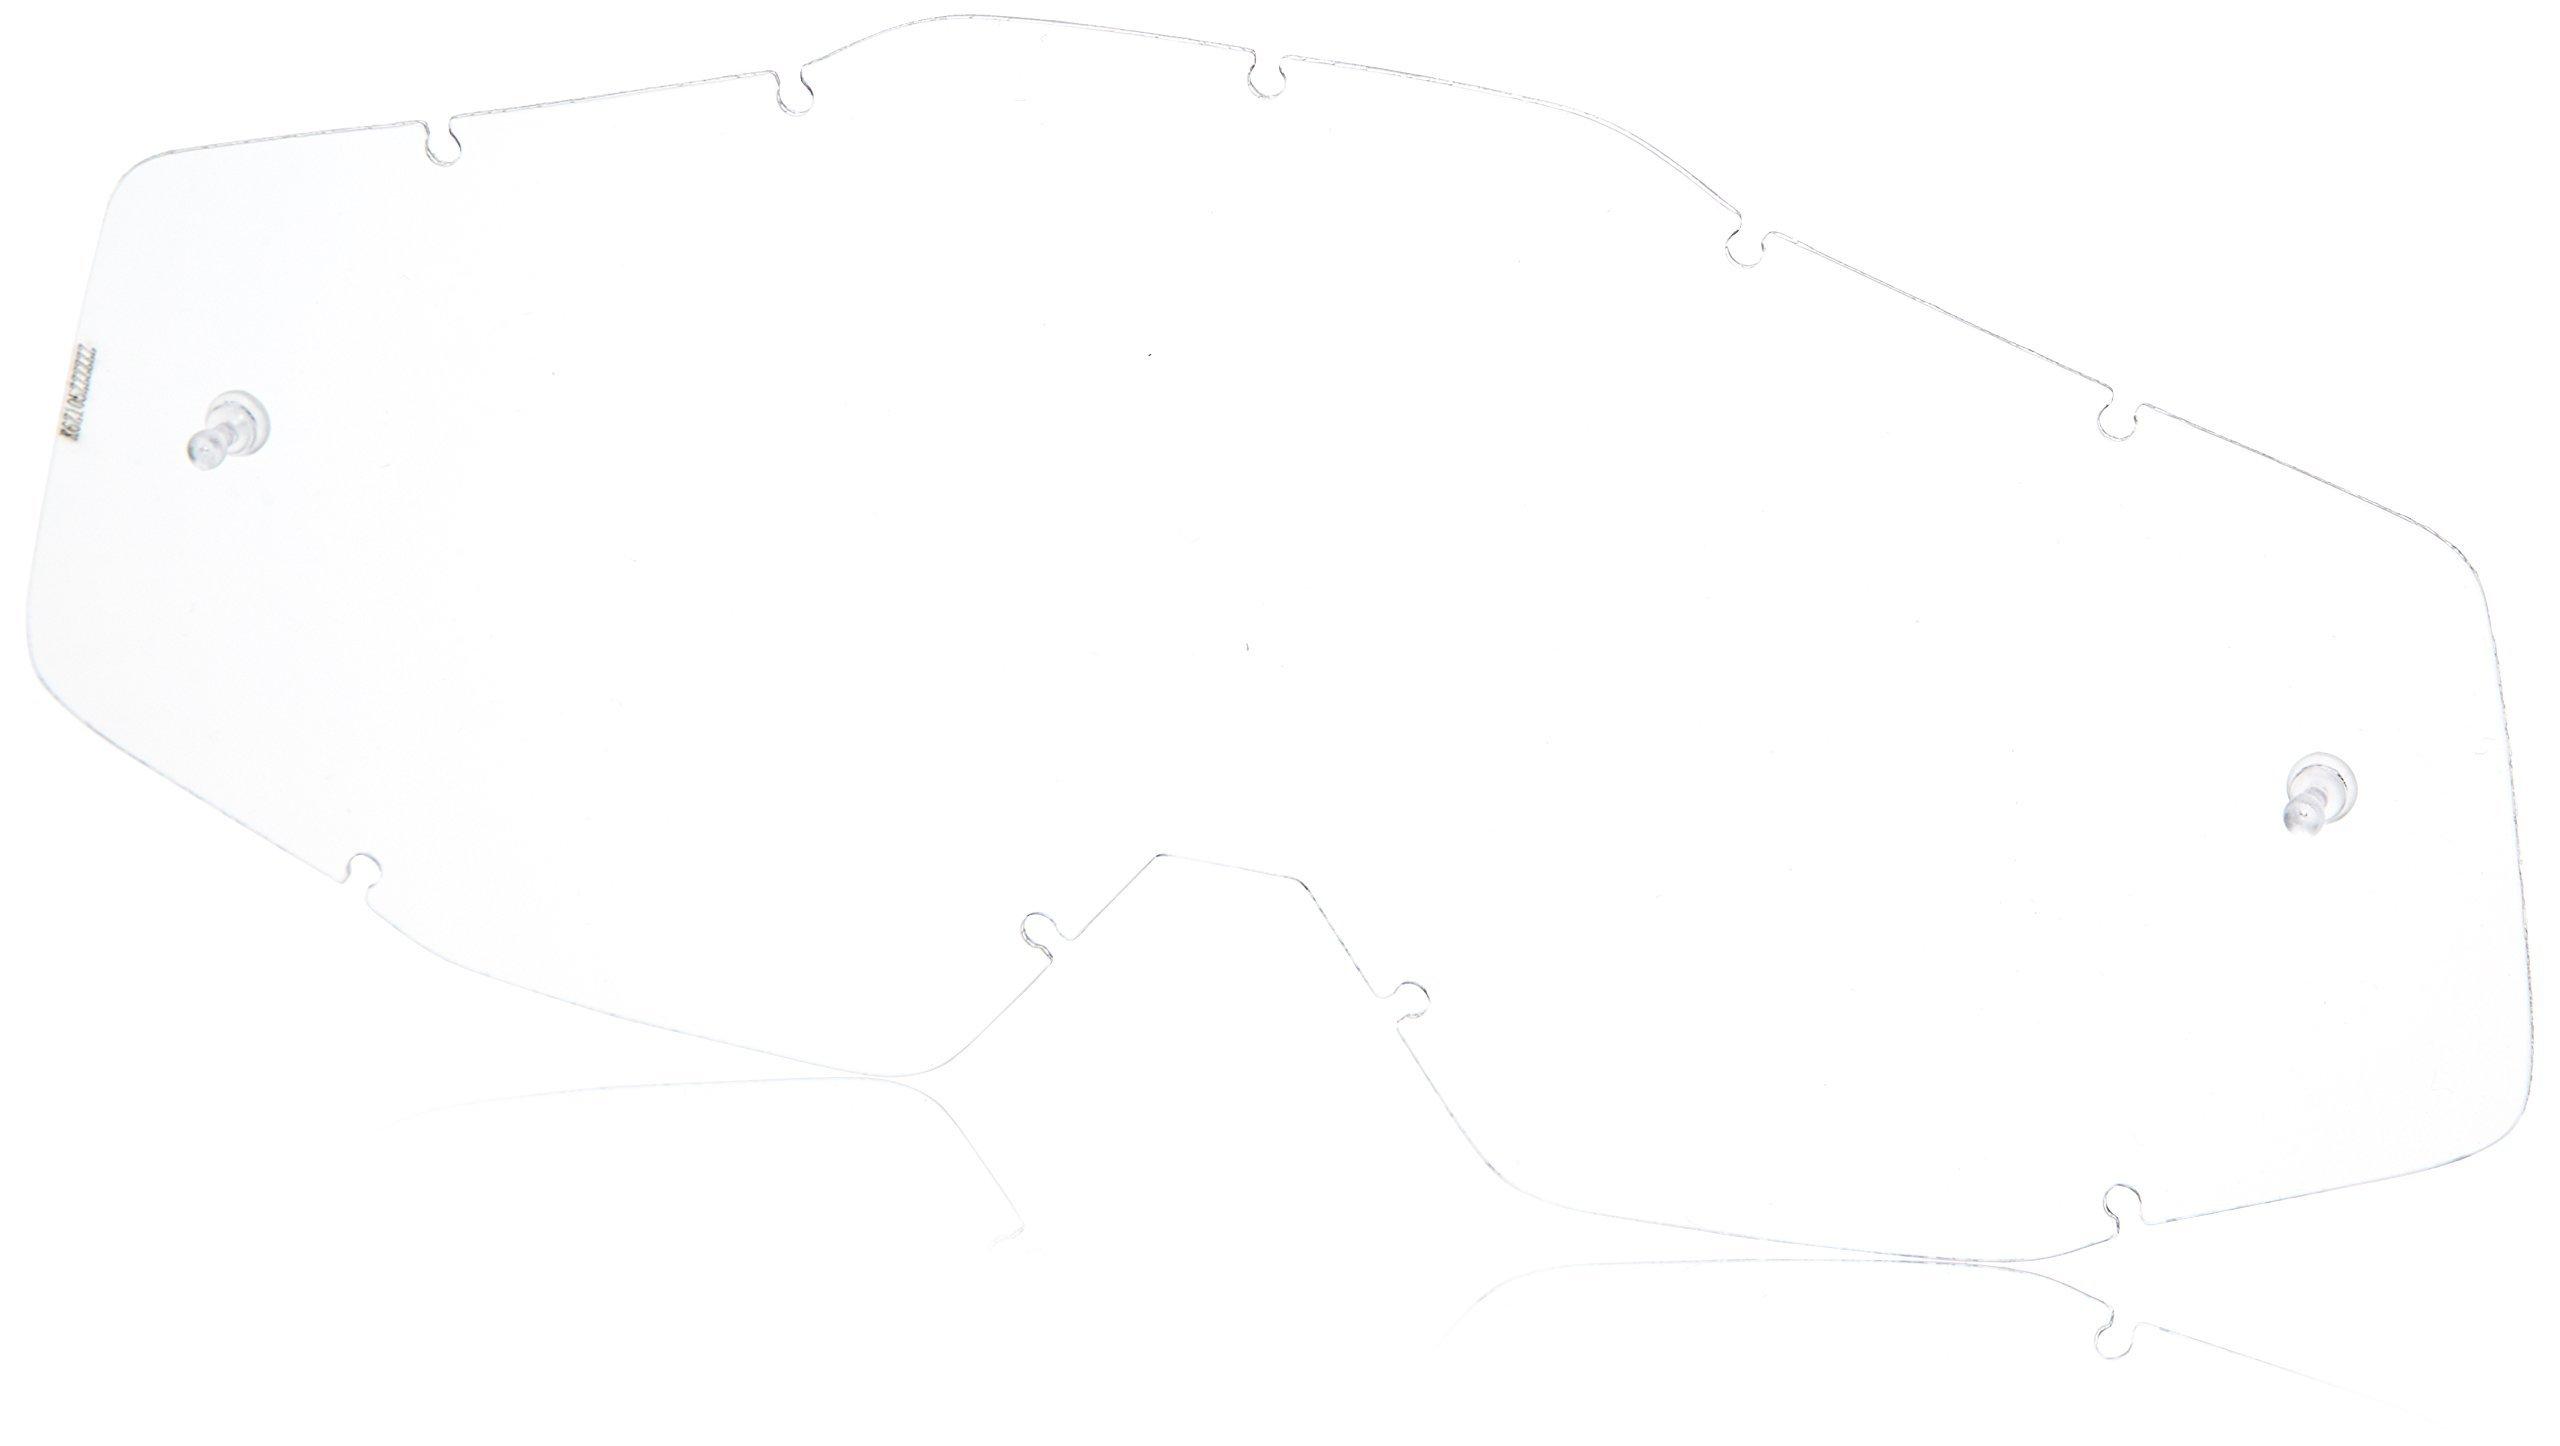 100% 50110-002-02 unisex-adult Goggle (Cobalt/Mirror Blue,One Size) (RACECRAFT RC COB BlueE Mirror Lens Blue)